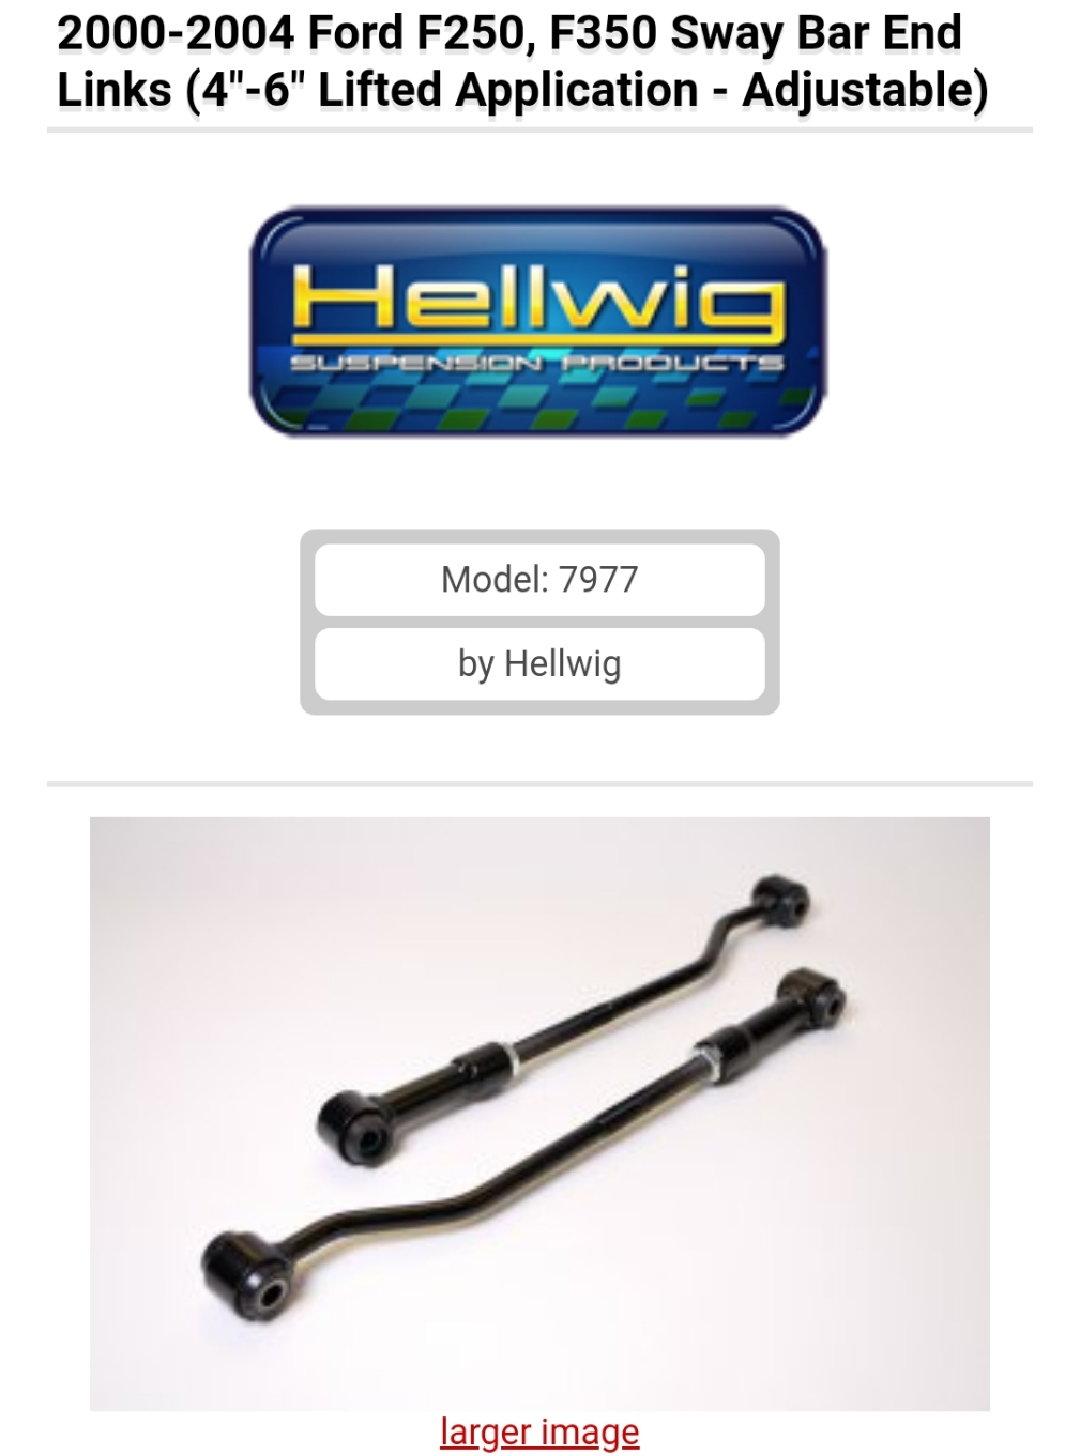 7977 4-6 Lift Sway Bar for Ford 250 Hellwig